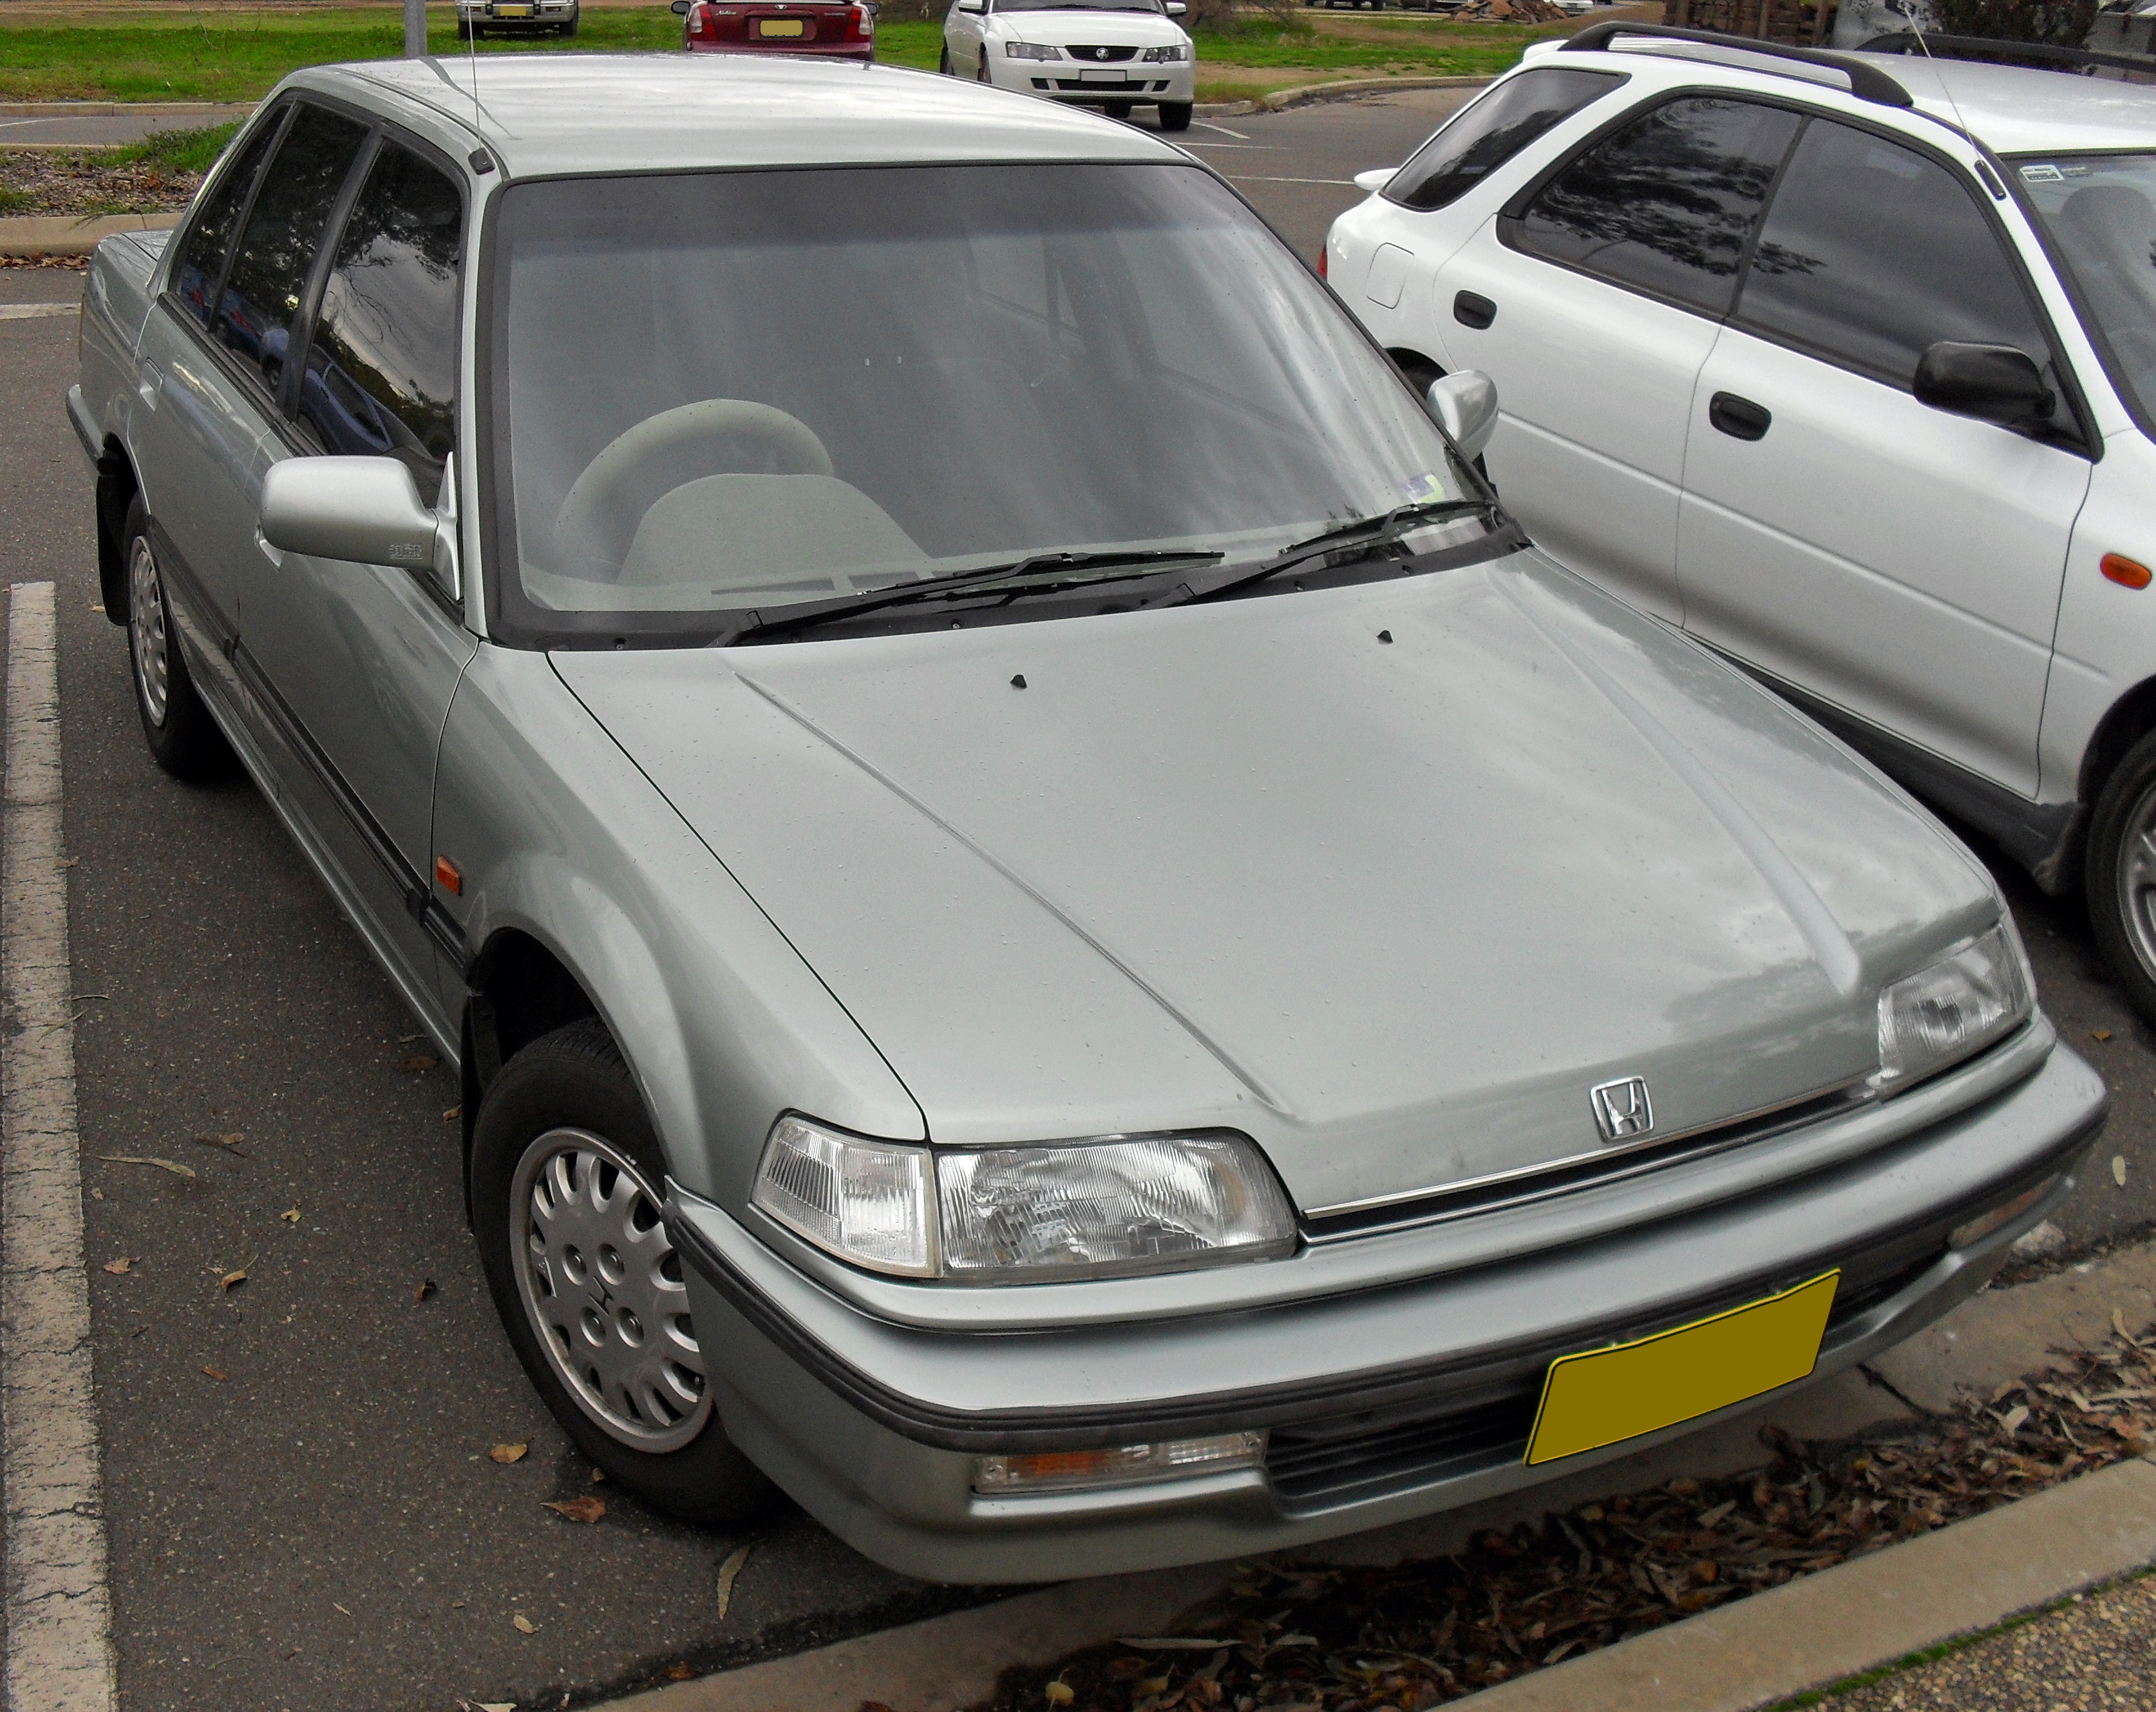 1988 honda civic gl 01jpg picture to pin on pinterest for Honda civic 1988